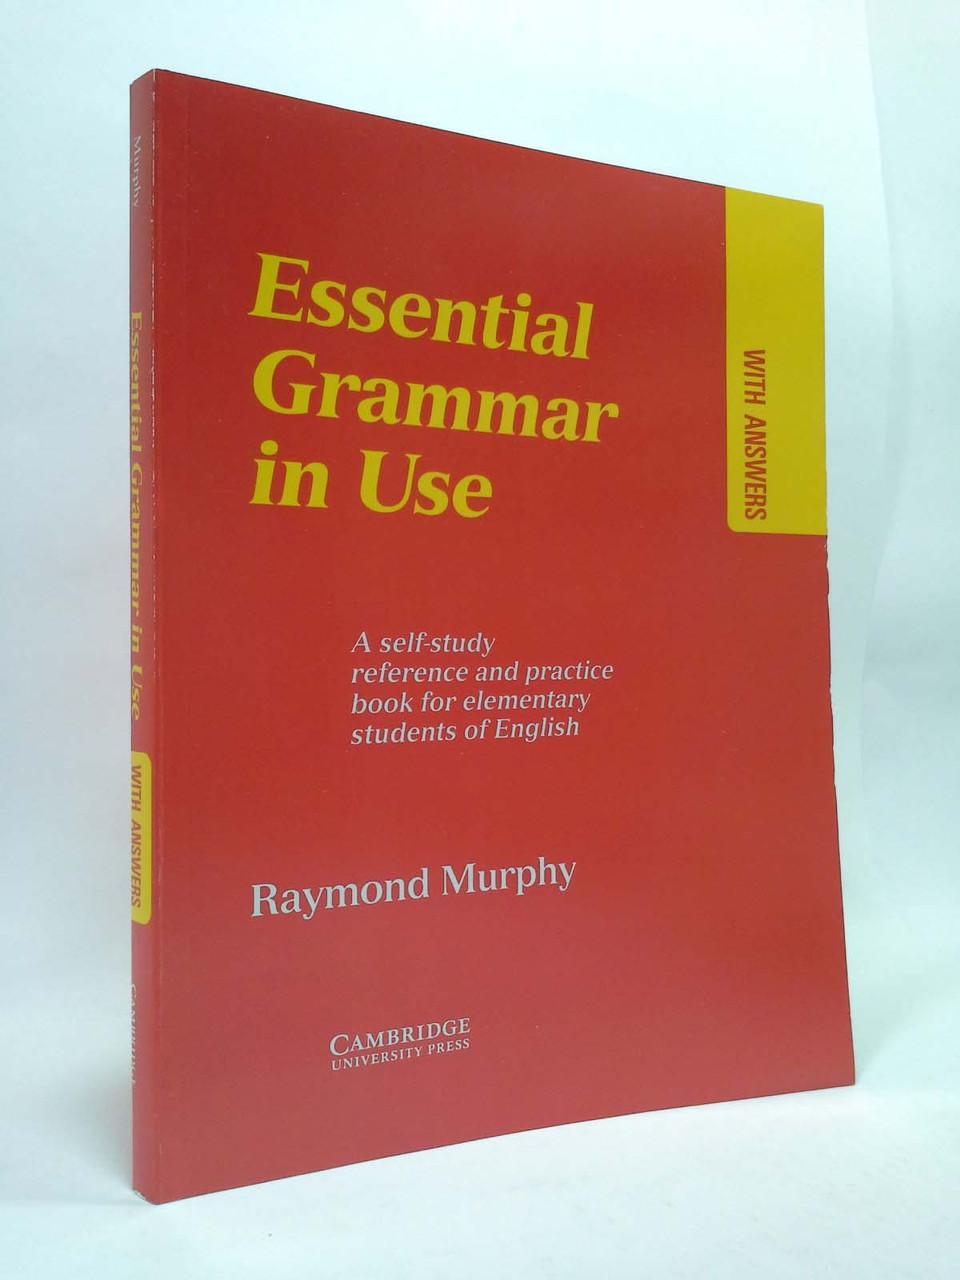 Essential Grammar in Use. Английская грамматика. Раймонд Мерфи. Кембридж.